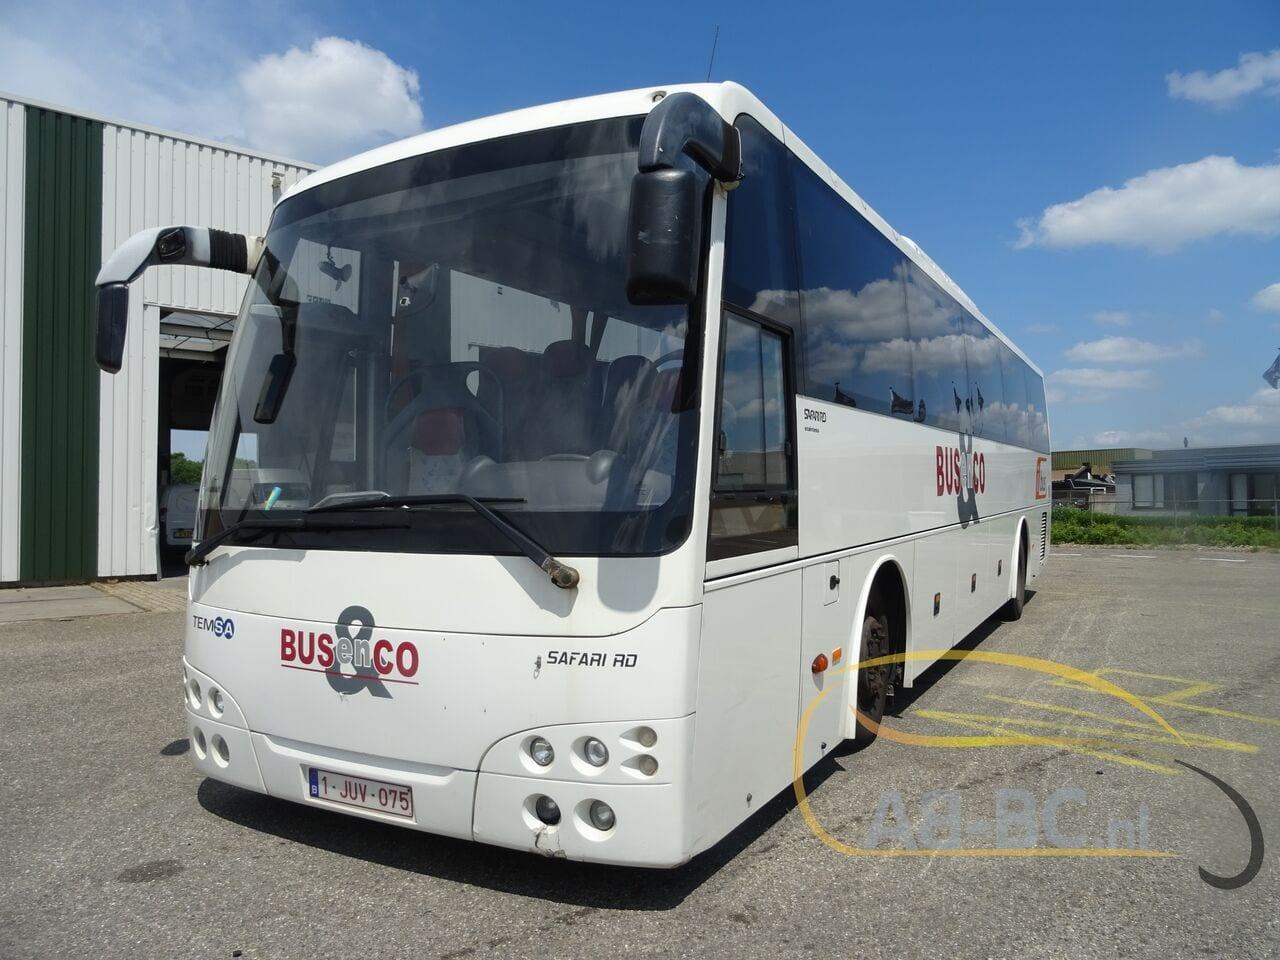 coach-busTEMSA-Safari-RD-DAF-Motor-53-Seats-Euro-5---1623932805740737249_big_47215eaa6a7172b9329bd77bc4127ebe--21061715155620919600